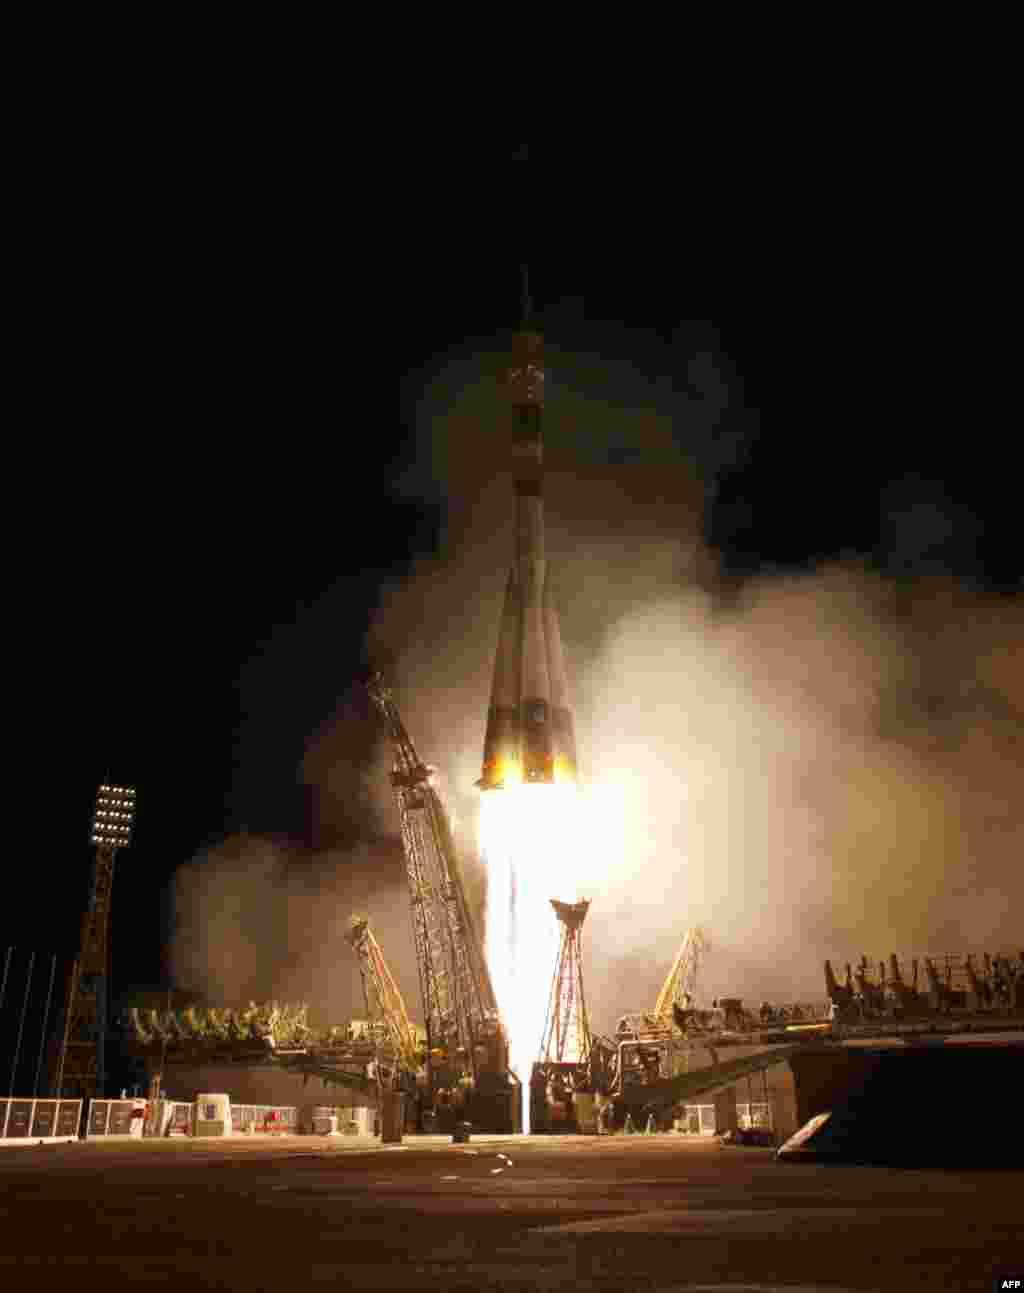 Ксмодром «Байконур» 5 апреля 2011 год. Запуск космического корабля Союз ТМА-21